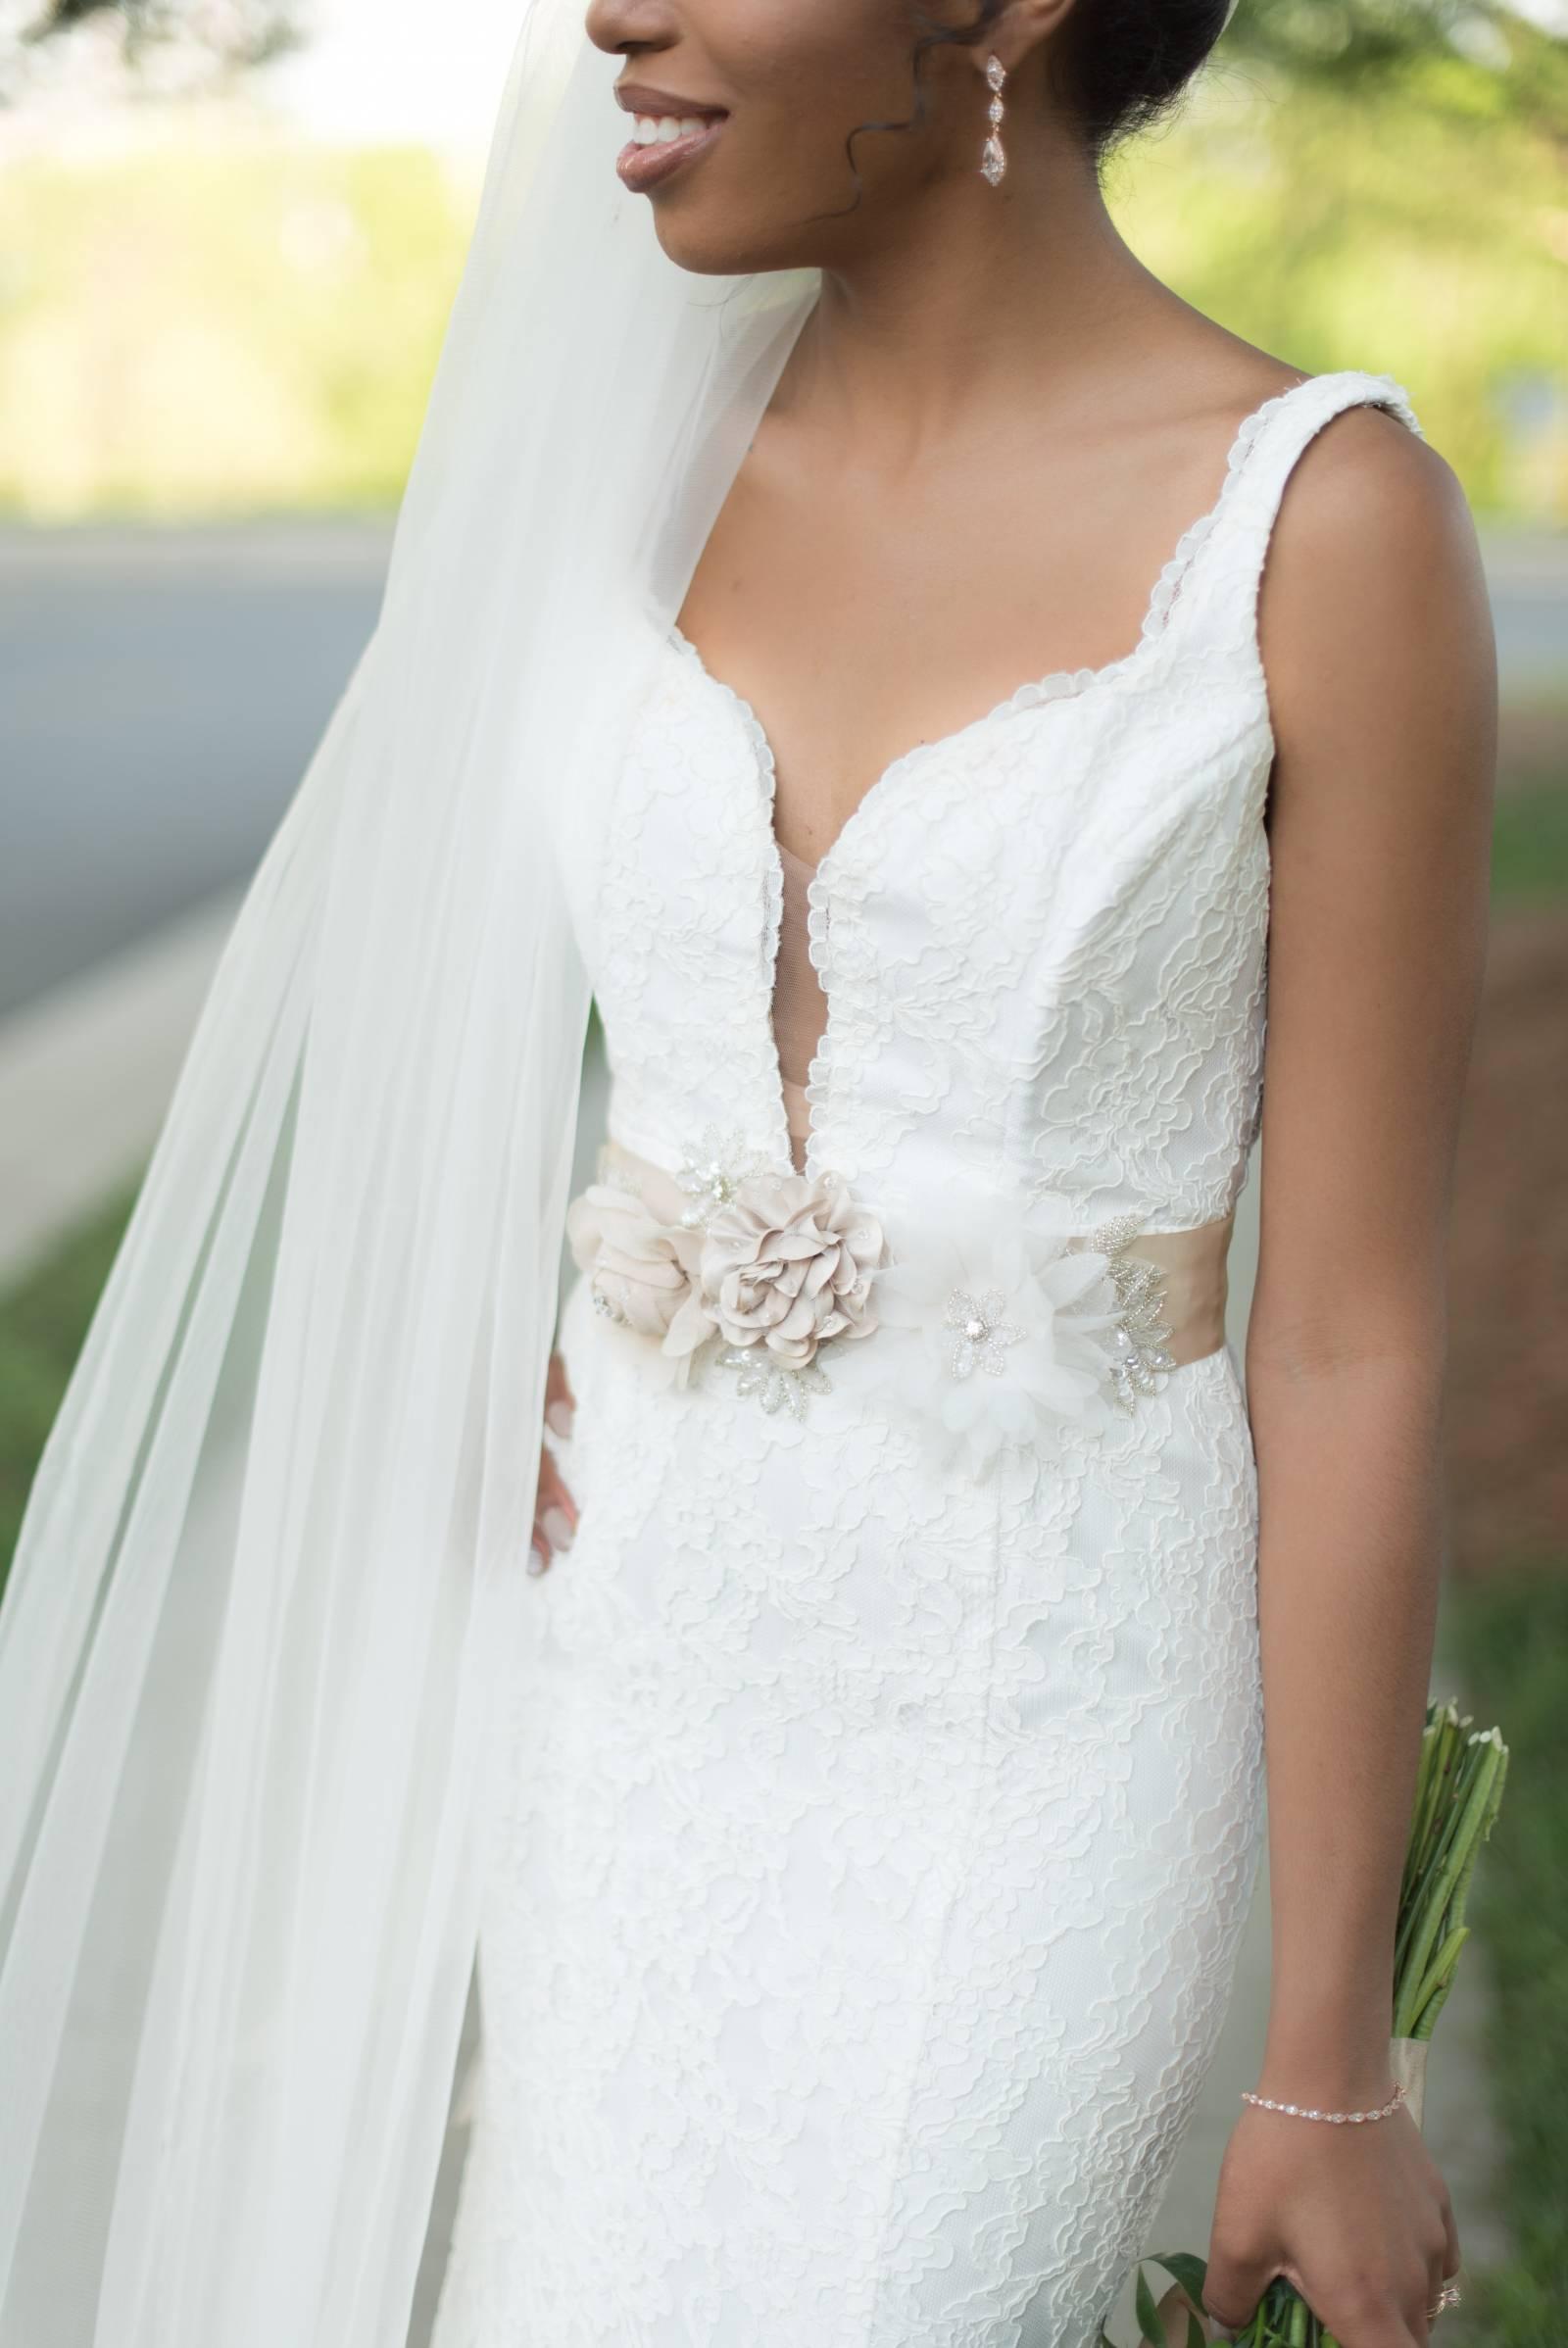 Ethiopian-American North Carolina Wedding   North Carolina Real Wedding